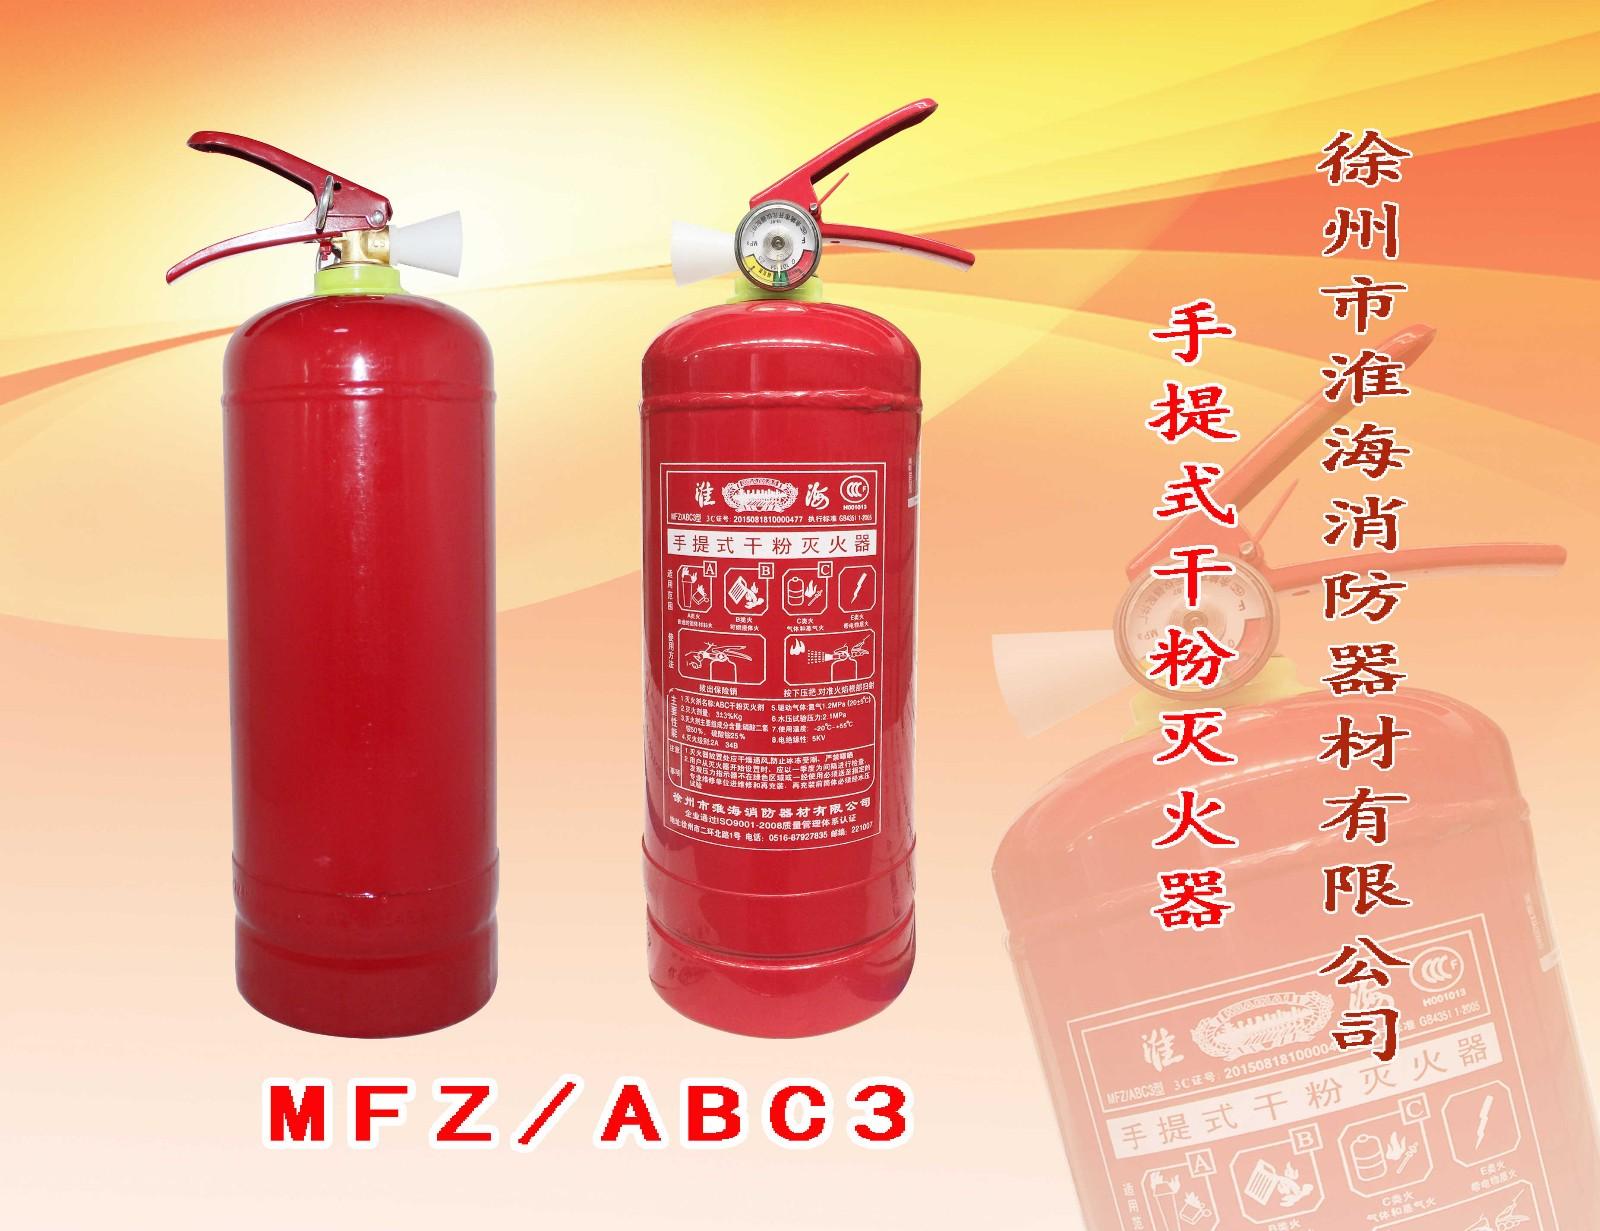 MFZABC3.jpg